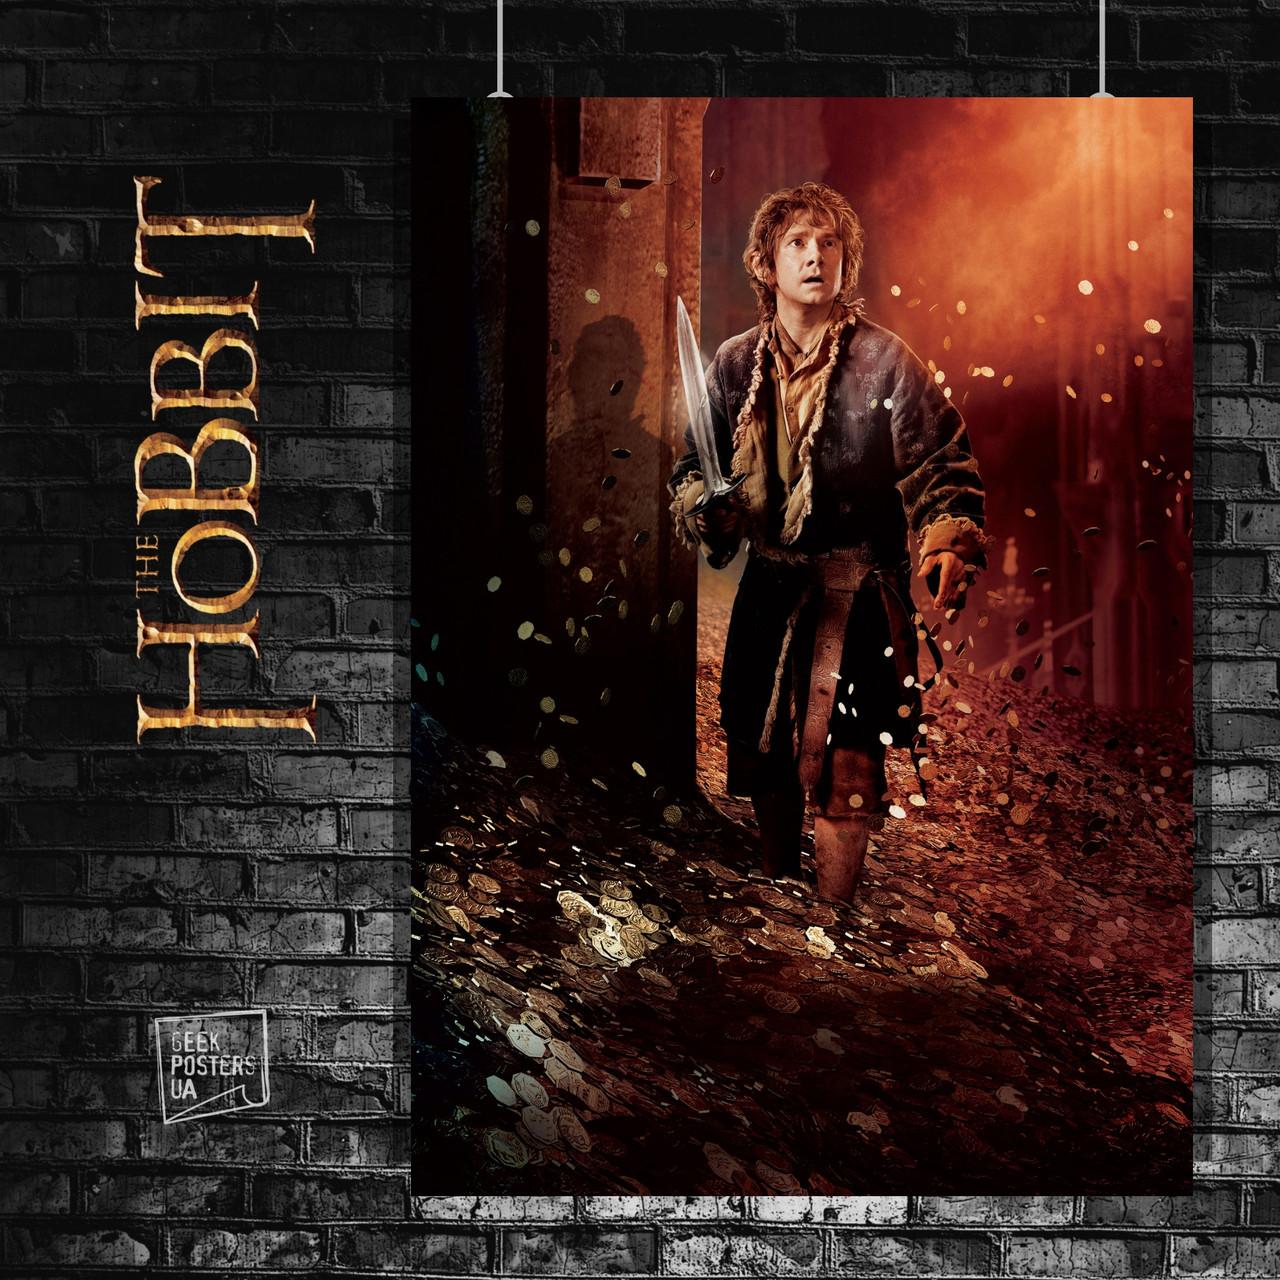 Постер Хоббит Бильбо Бэггинс в логове Смоуга. Властелин Колец, Lord Of The Rings, Hobbit. Размер 60x42см (A2). Глянцевая бумага